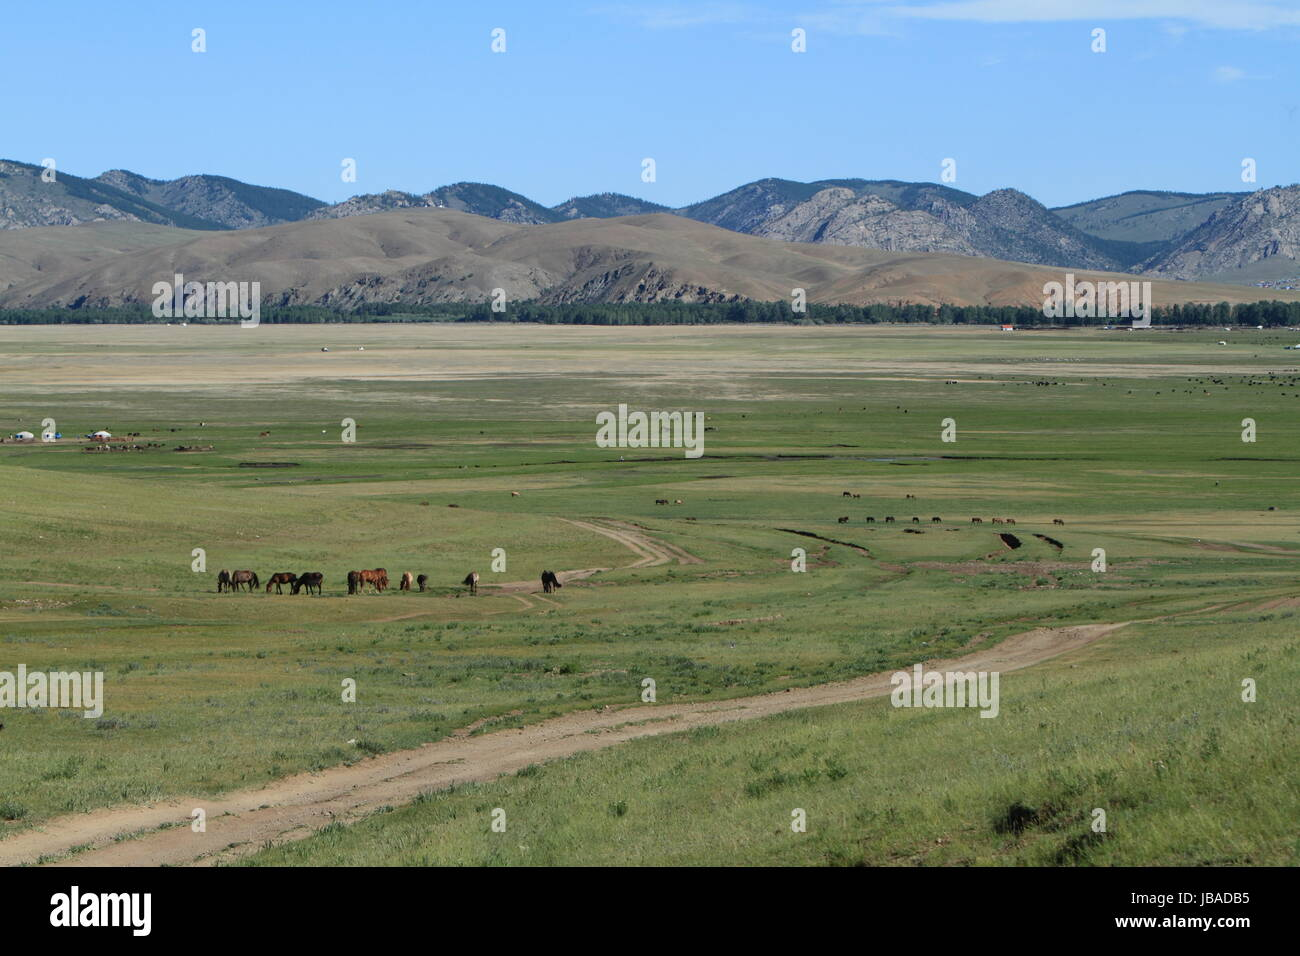 steppe infinite - Stock Image